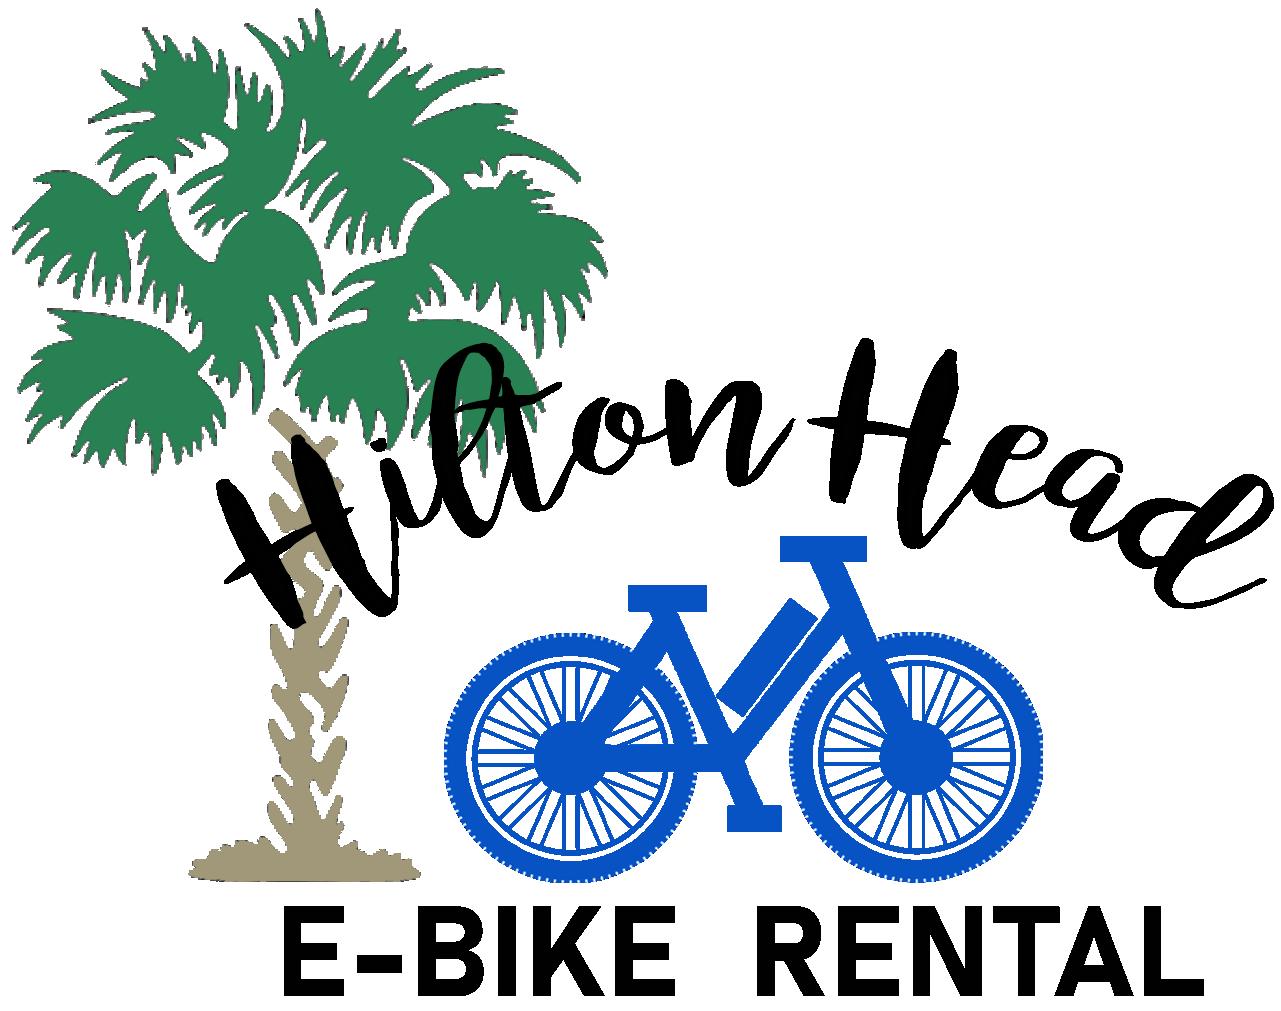 Hilton Head Electric Bike Rentals | Fat Tire Electric Bikes For Touring Hilton Head Island